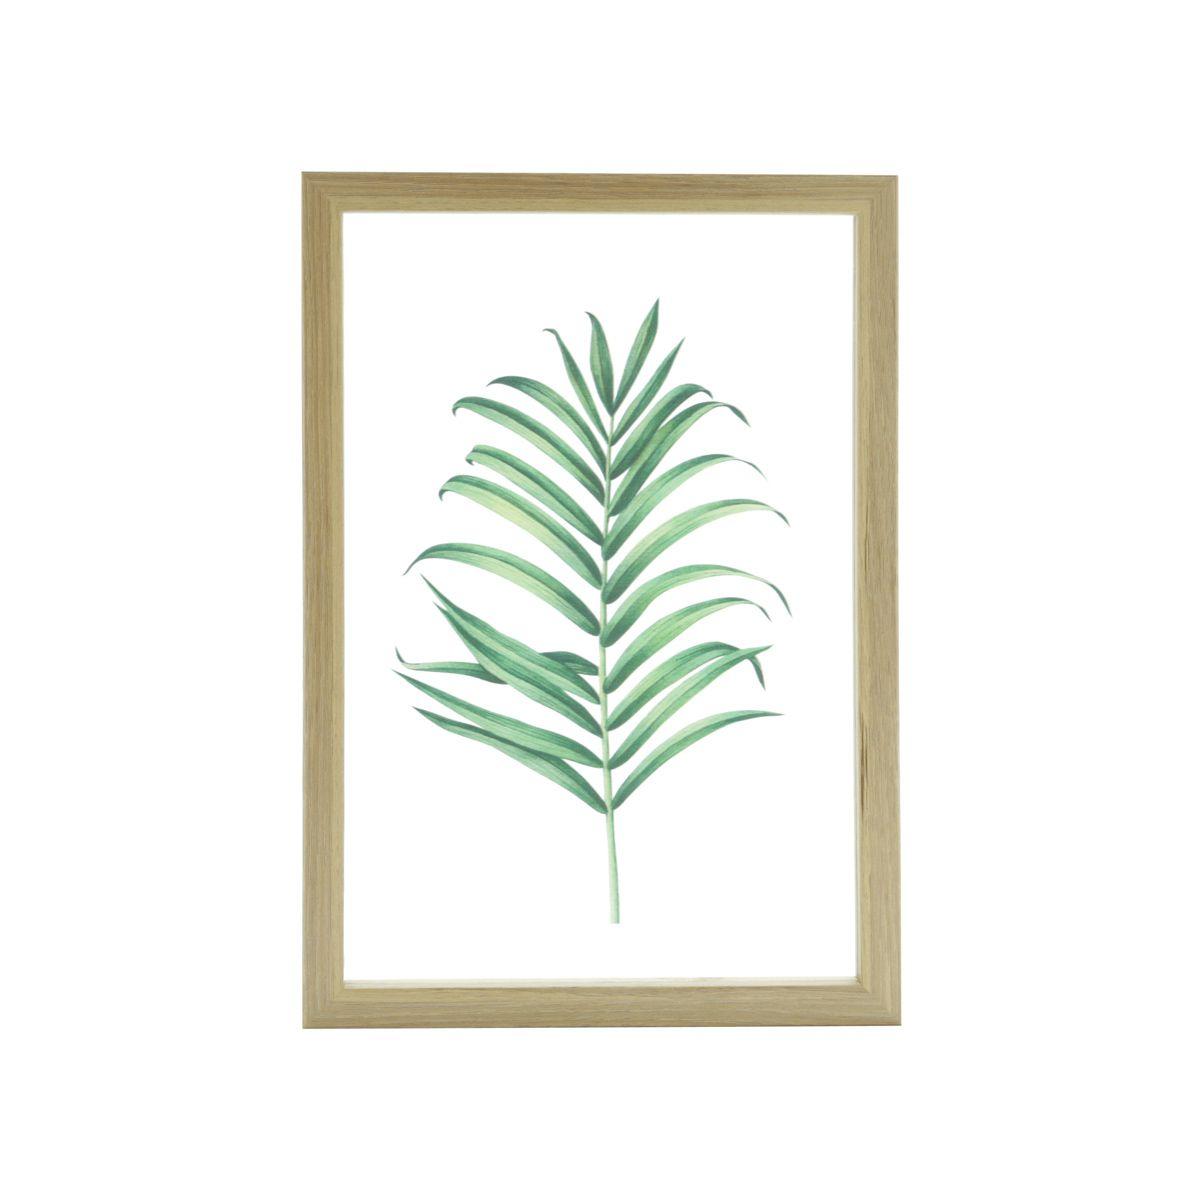 Quadro Decorativo Palm Leaf 32cm x 22cm - 41923